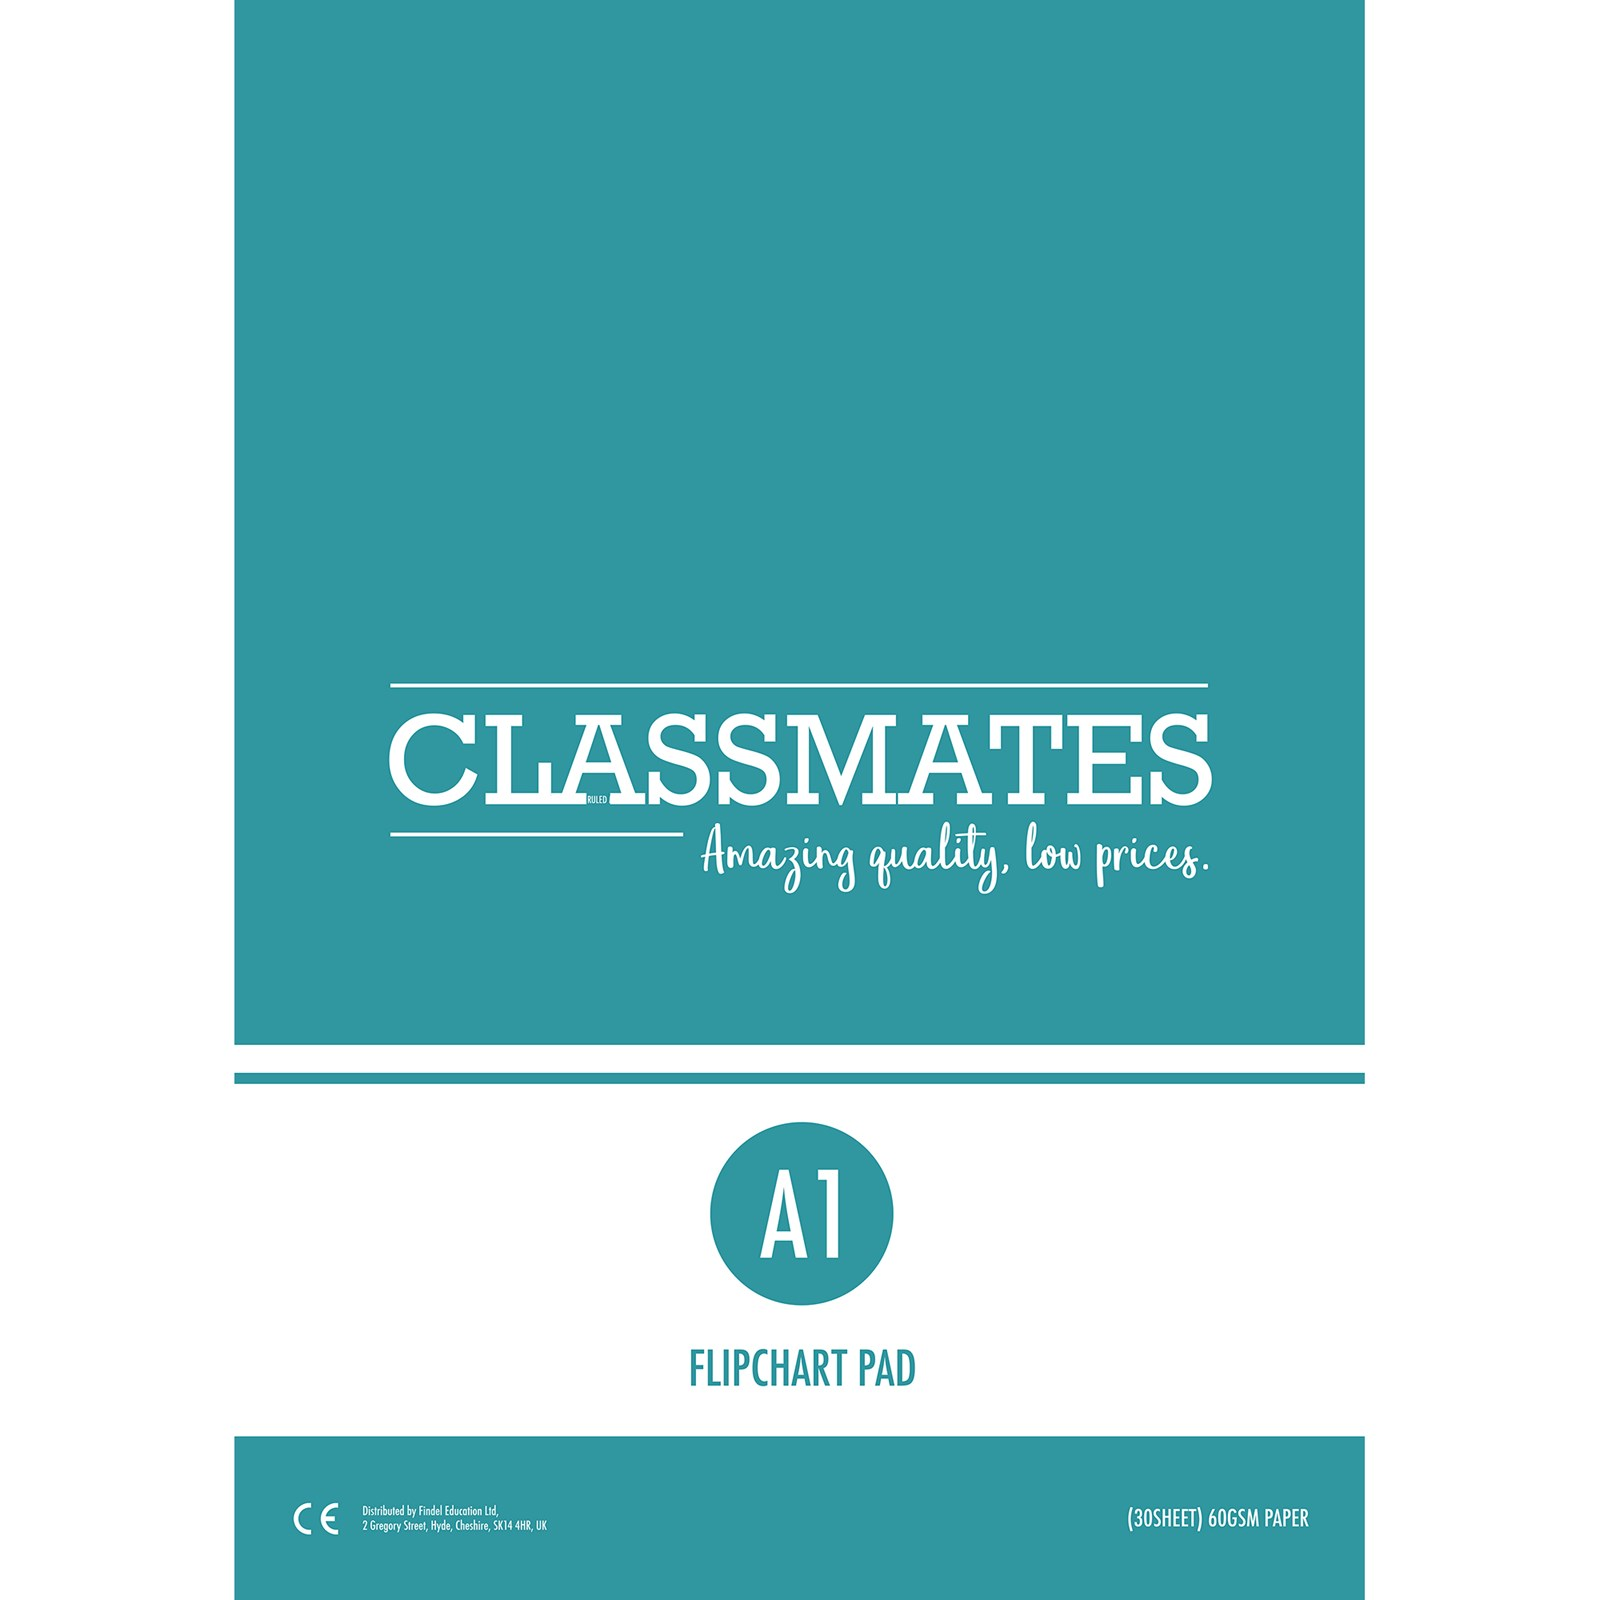 Classmates Plain Flipchart Pads